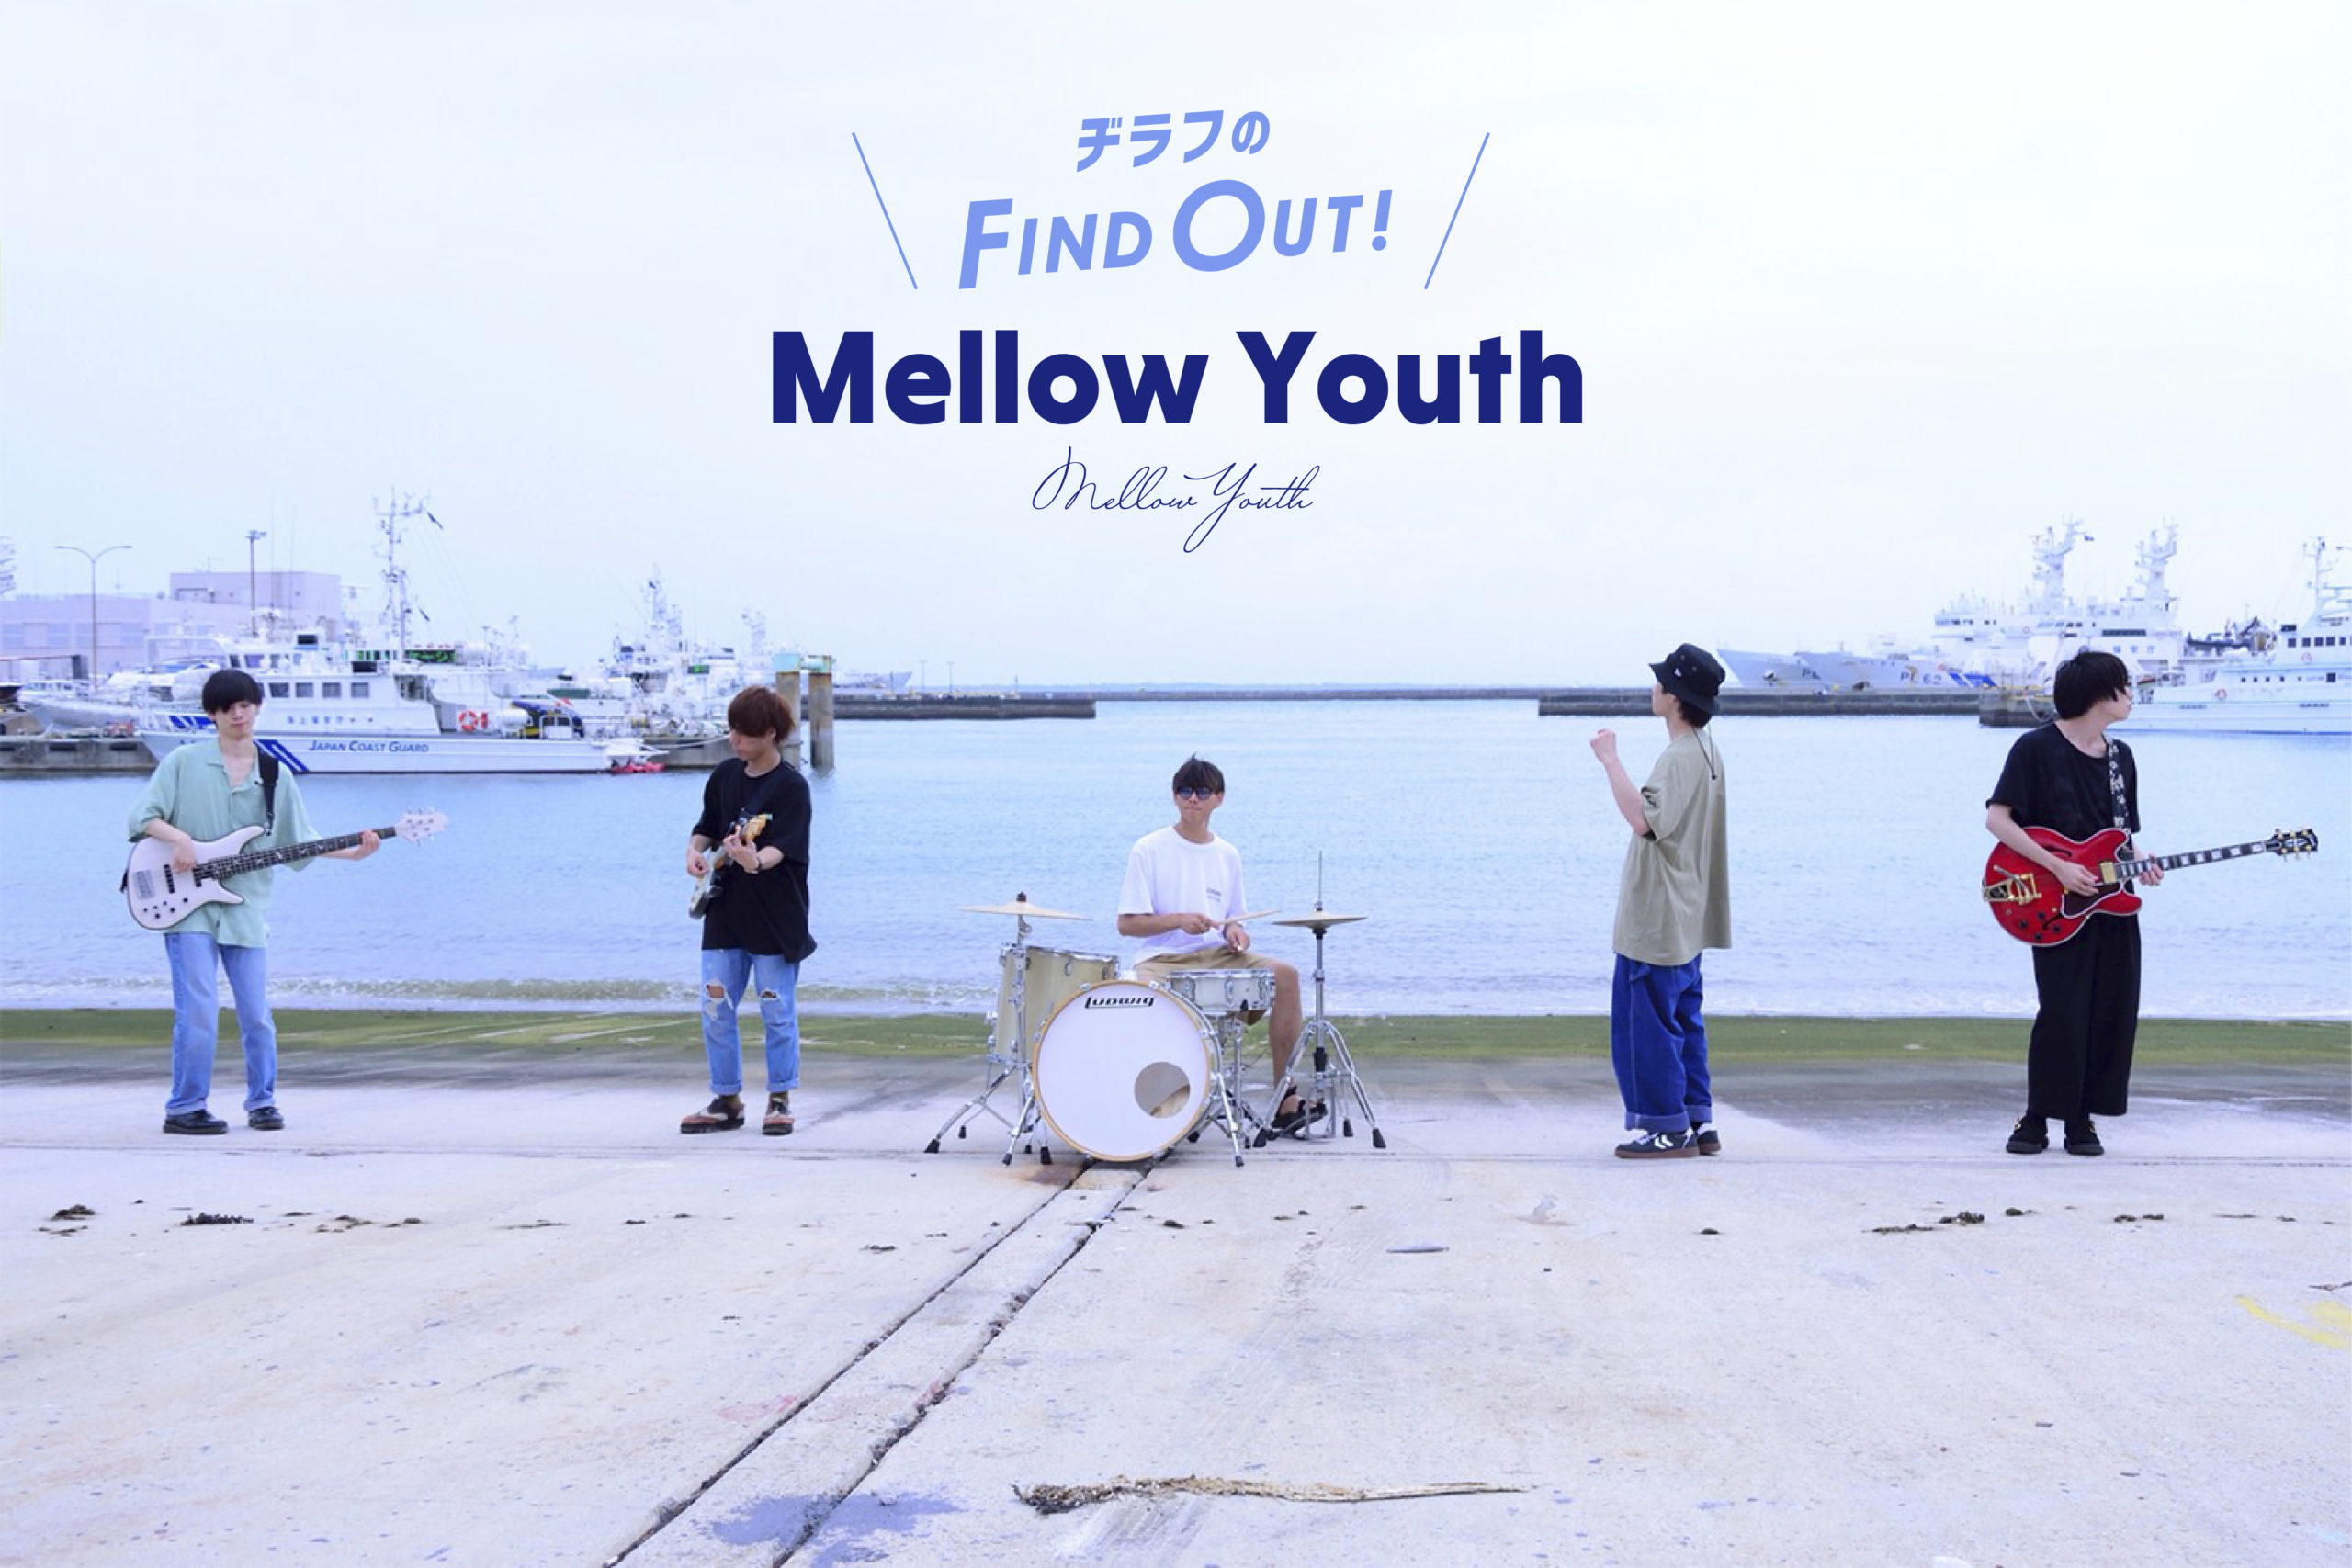 「【Mellow Youth】アンニュイ&キャッチーな世界観は中毒性あり! 2017年結成のツインヴォーカルバンド」のアイキャッチ画像